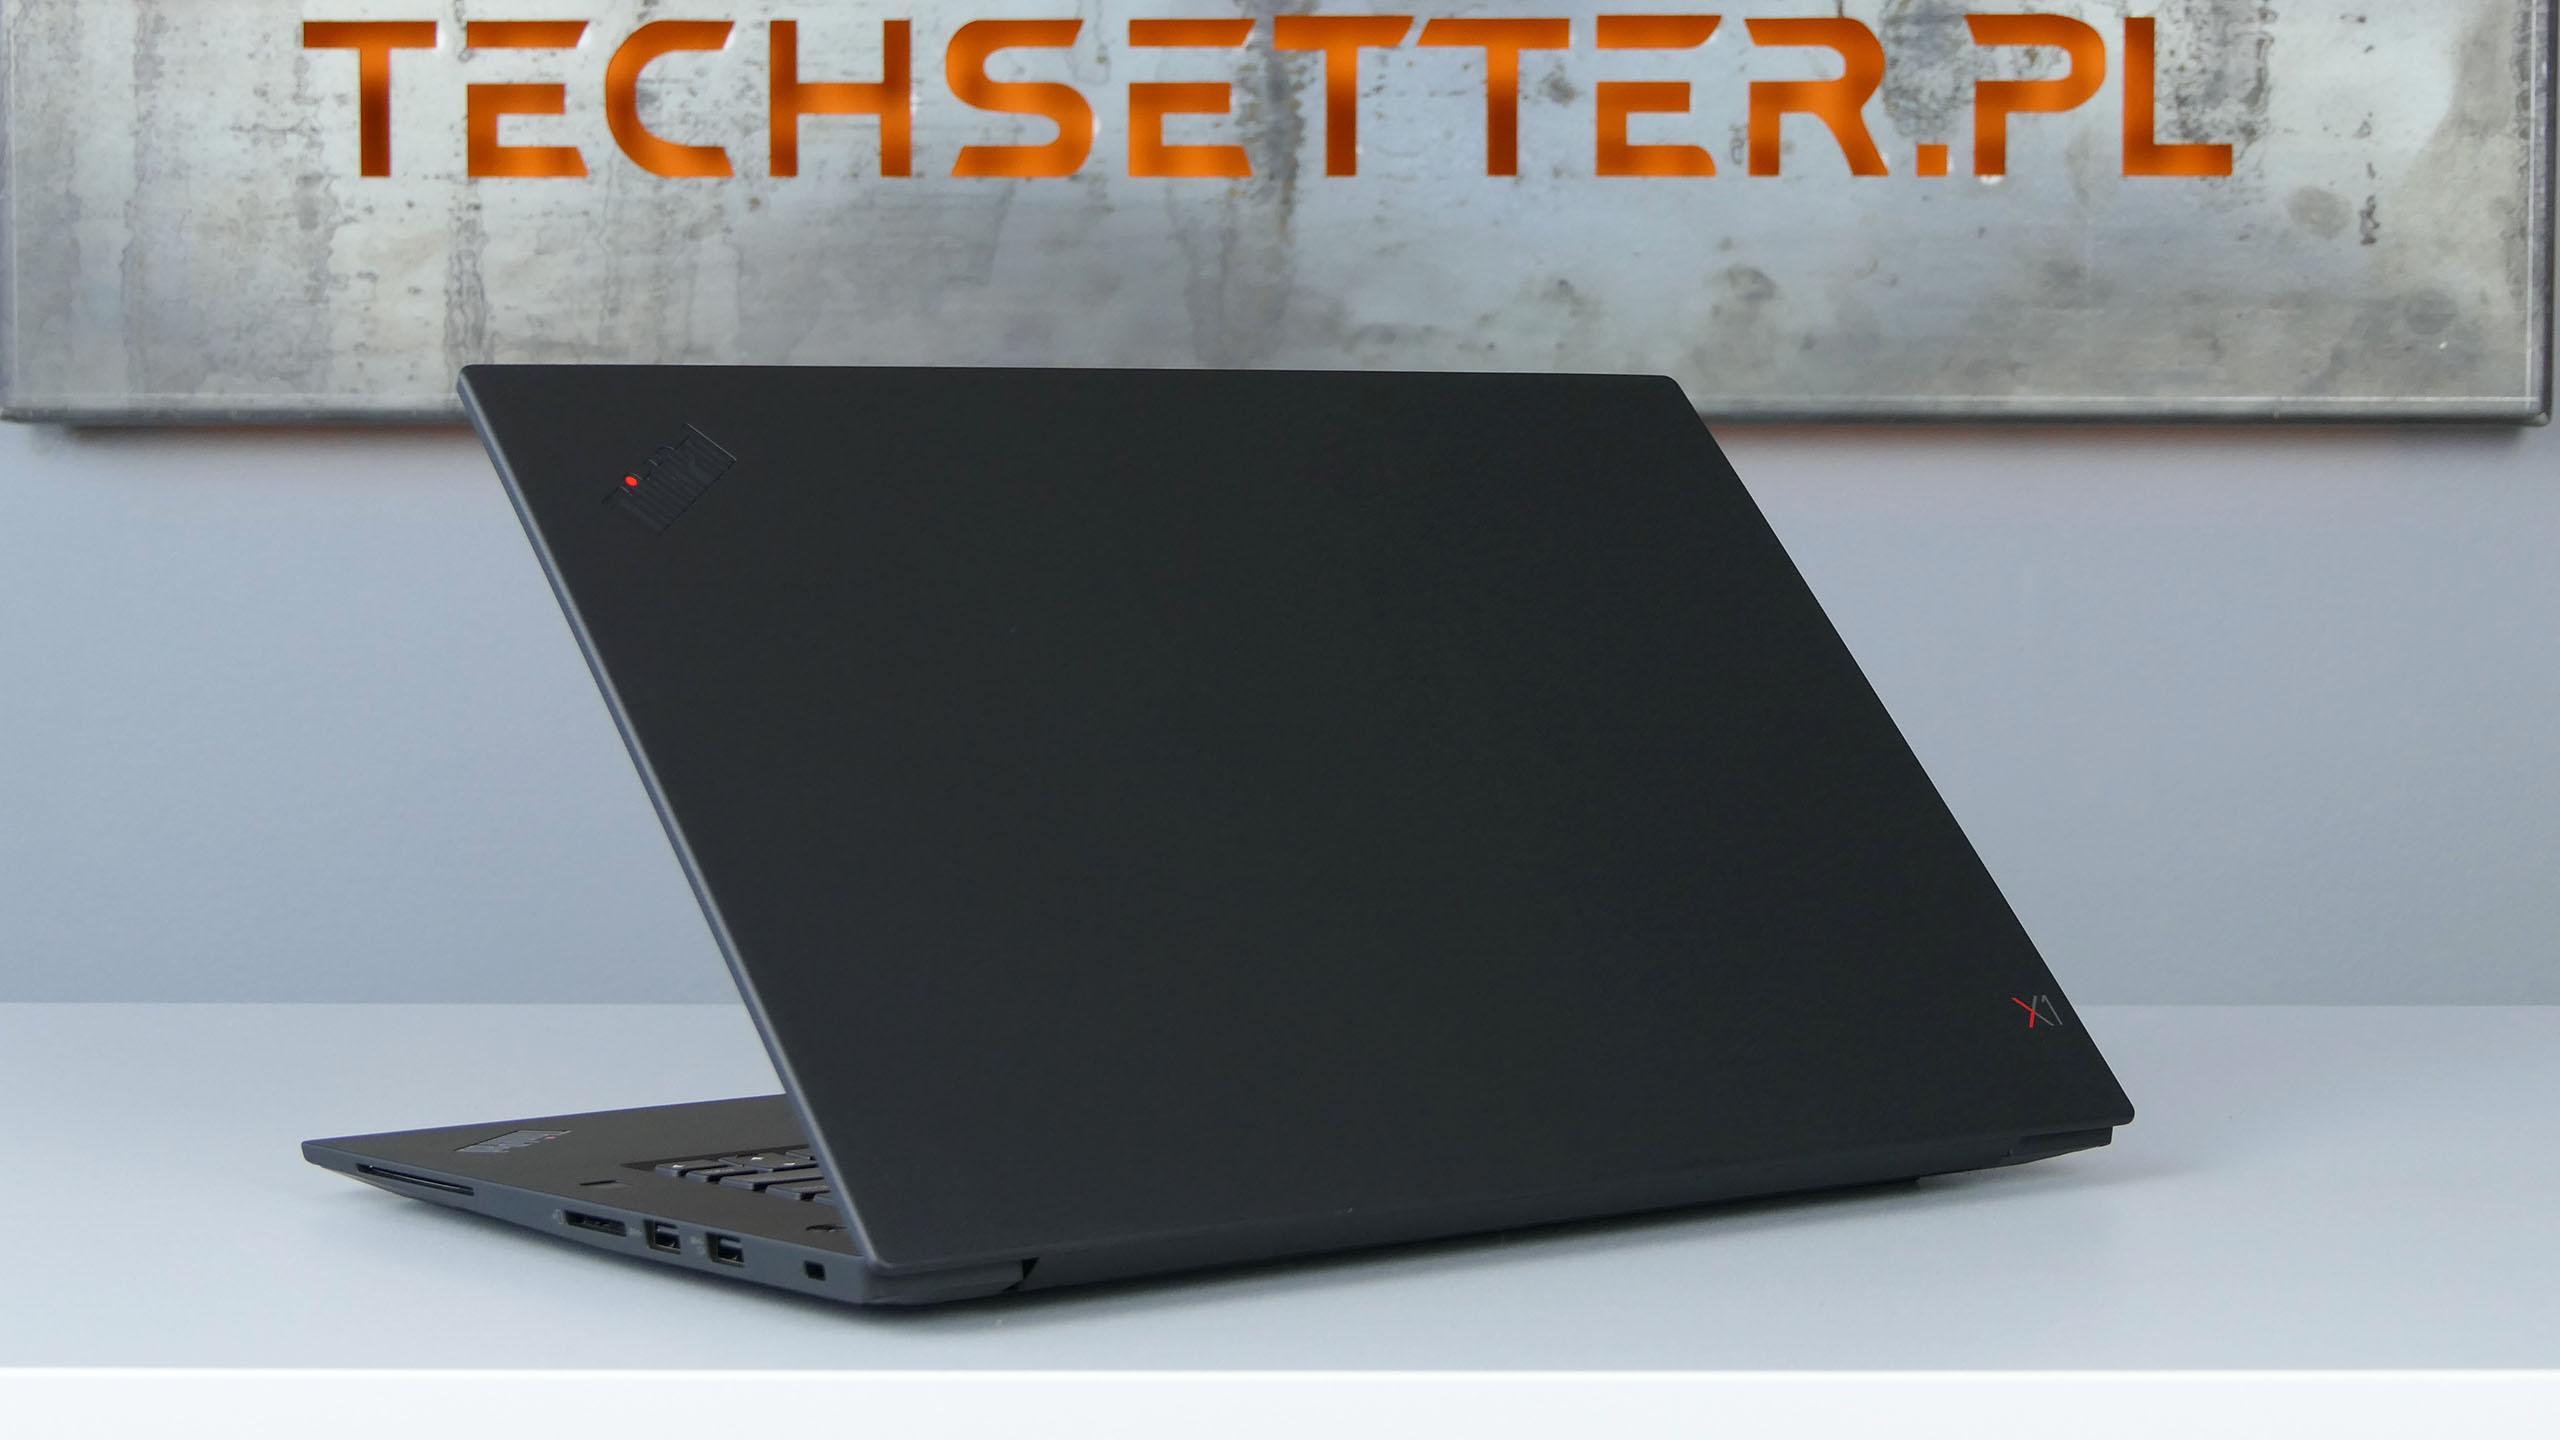 Lenovo ThinkPad X1 Extreme 2nd Gen